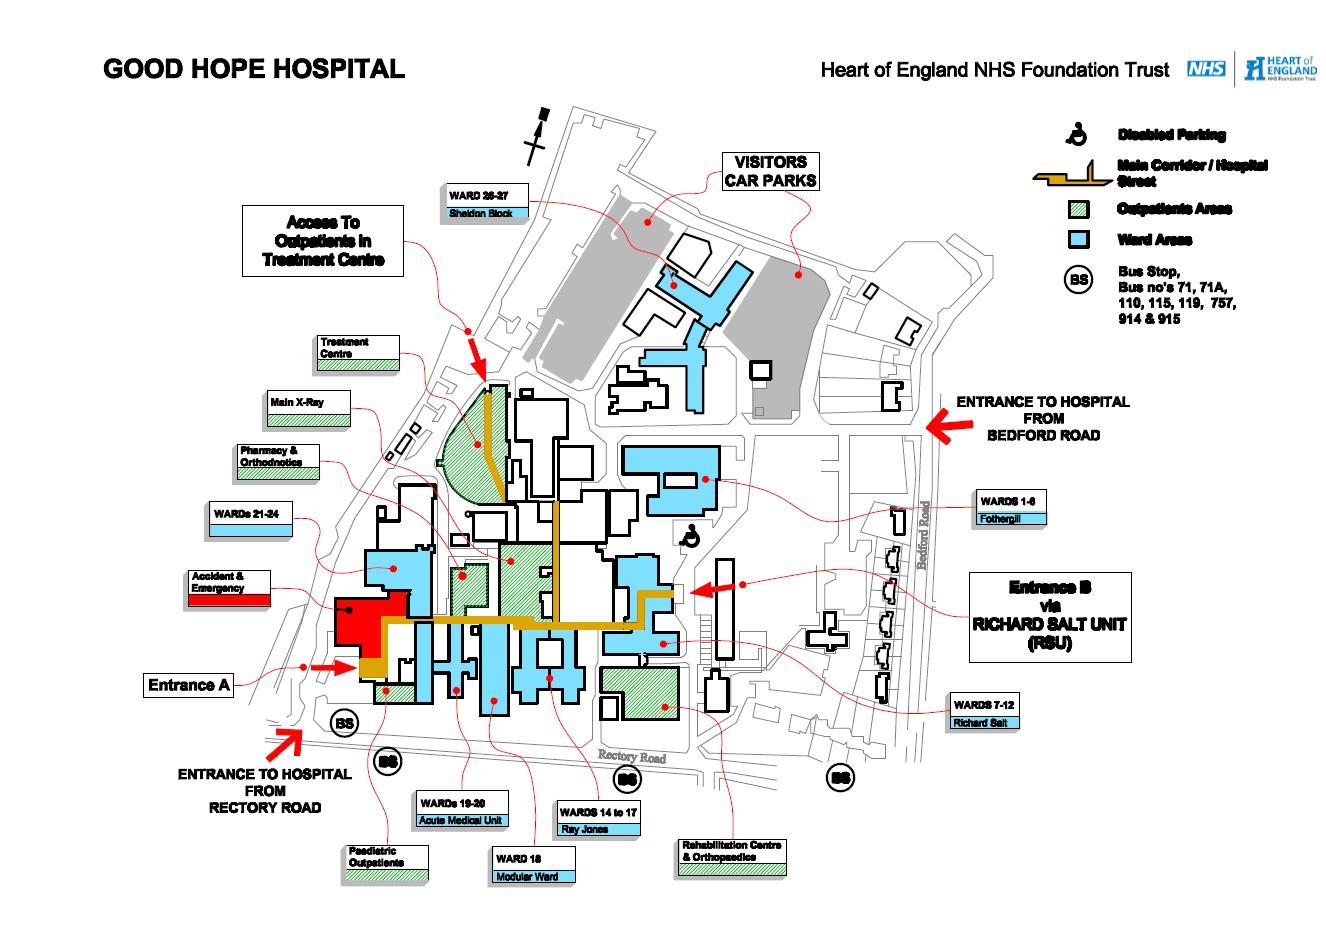 Map Of Uk Hospitals.Good Hope Site Map University Hospitals Birmingham Nhs Foundation